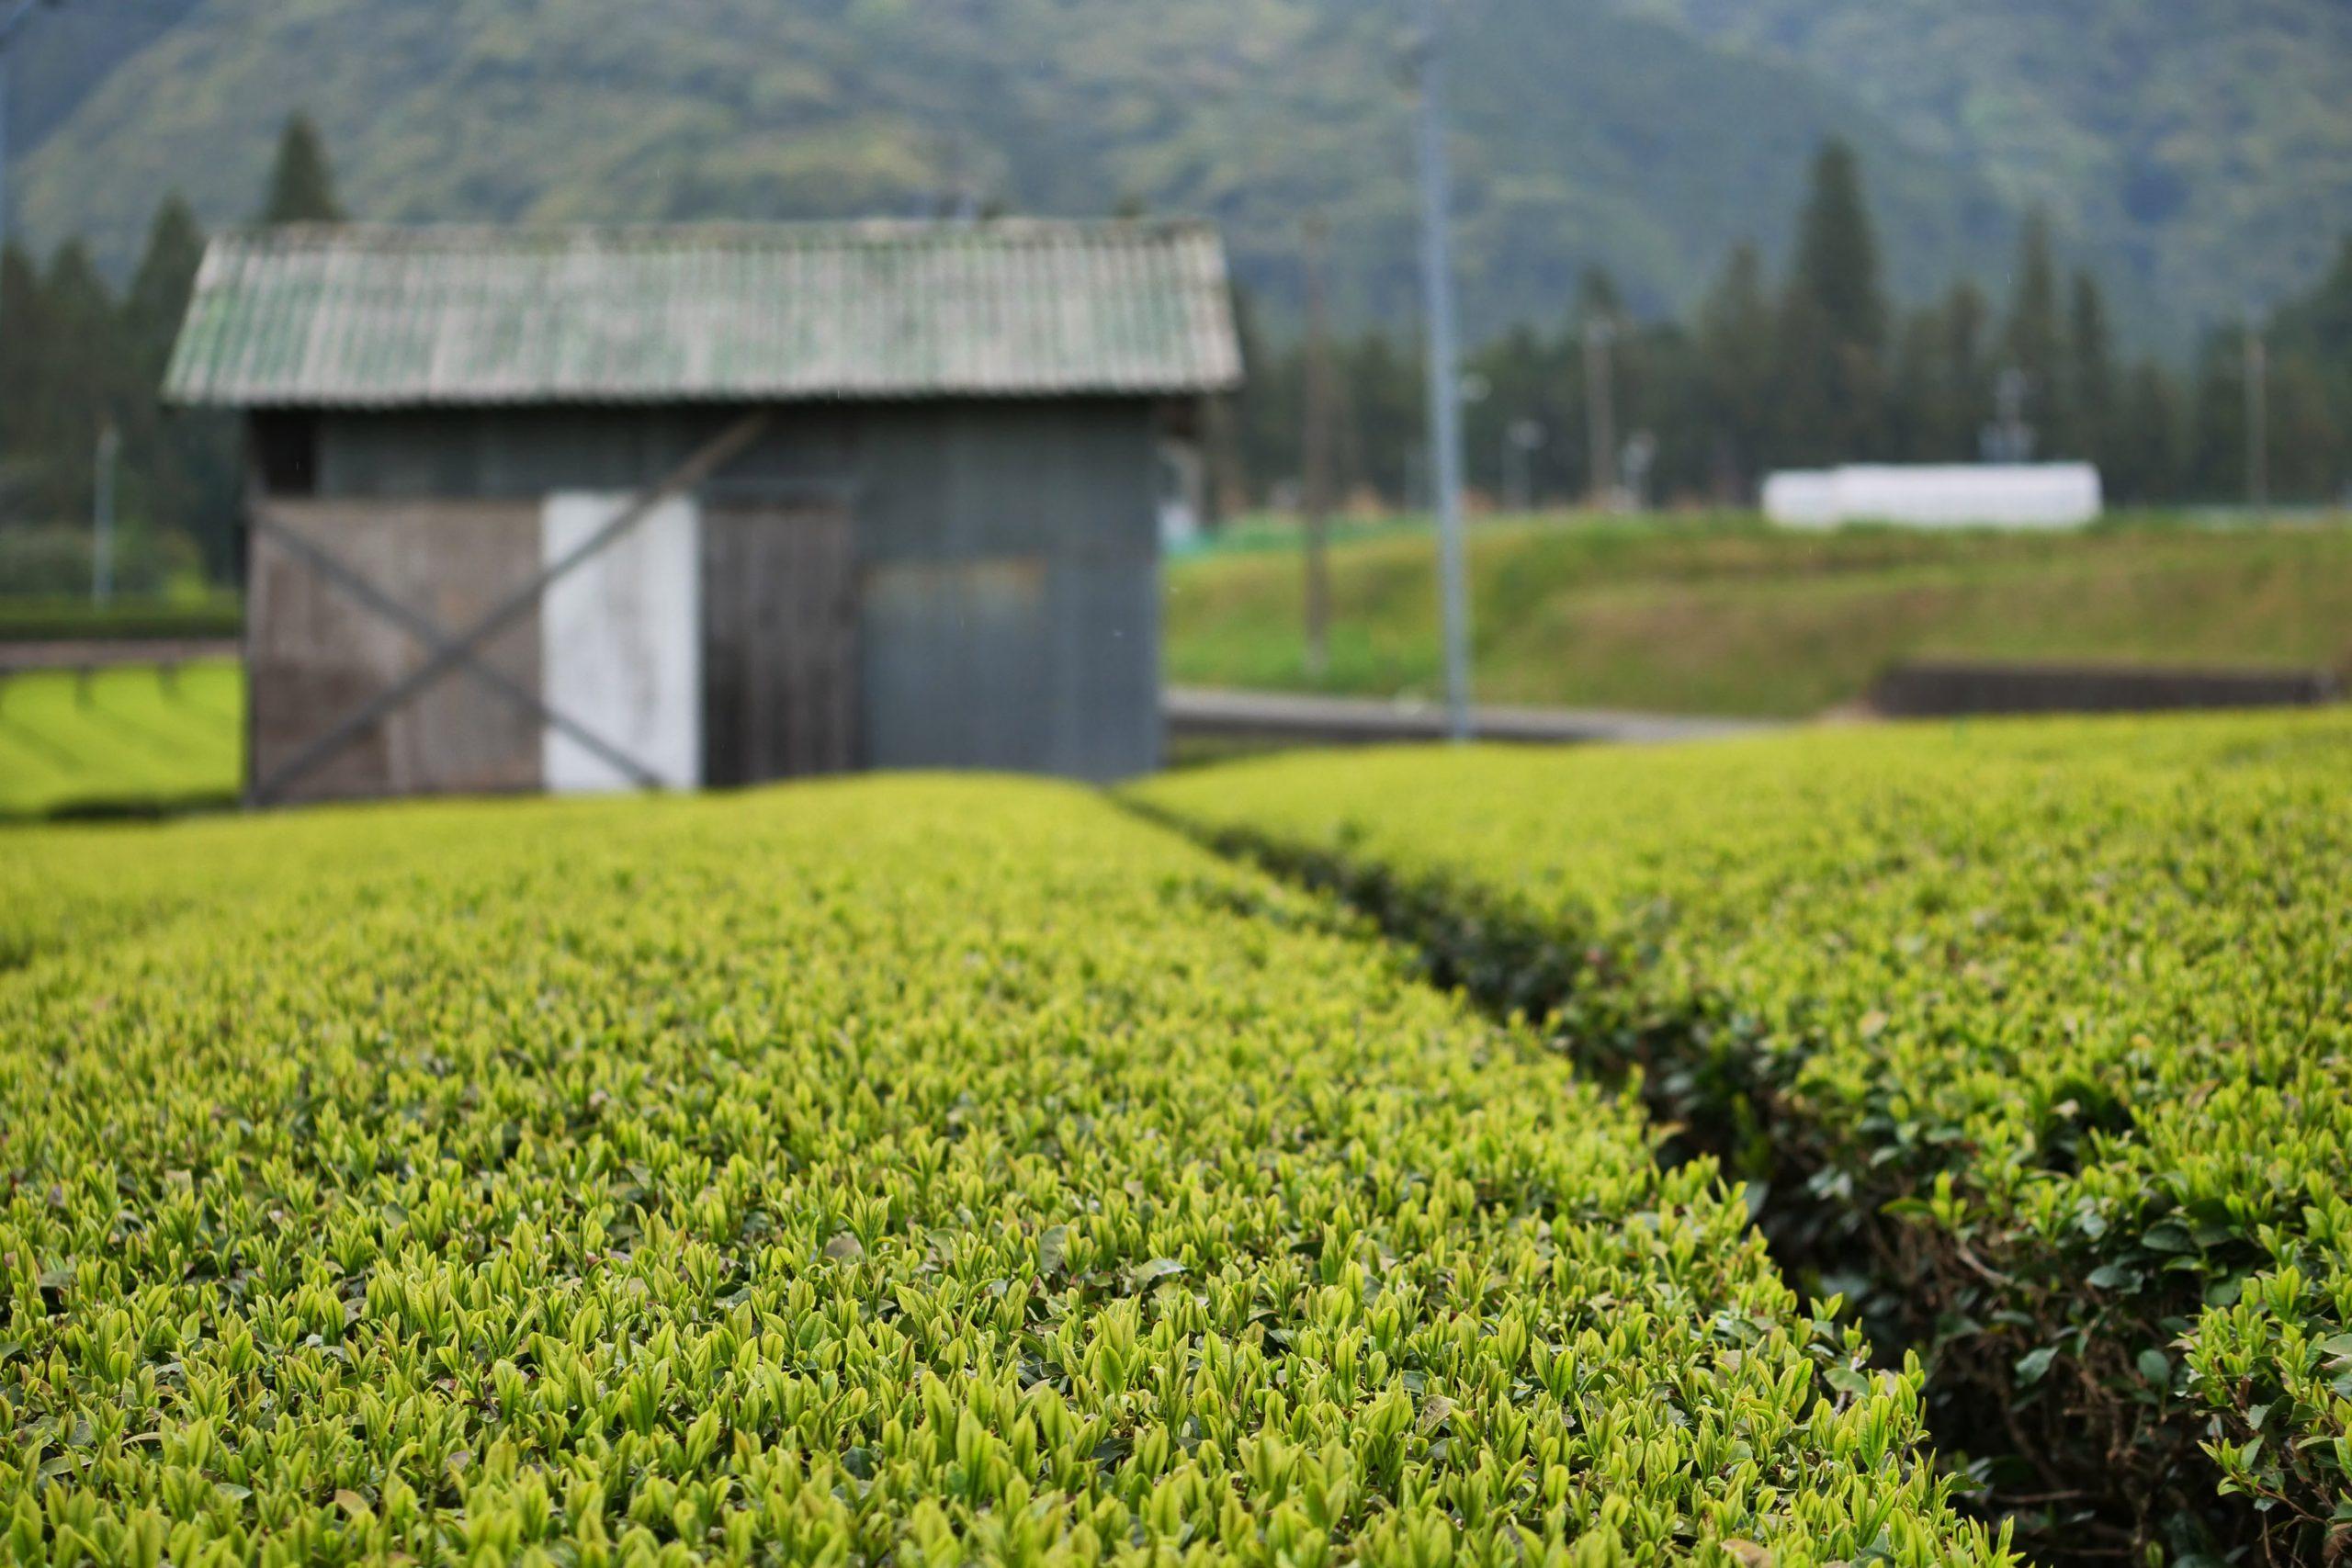 Asatsuyu Cultivar tea garden parcel in the garden of Hayashi family in Mie